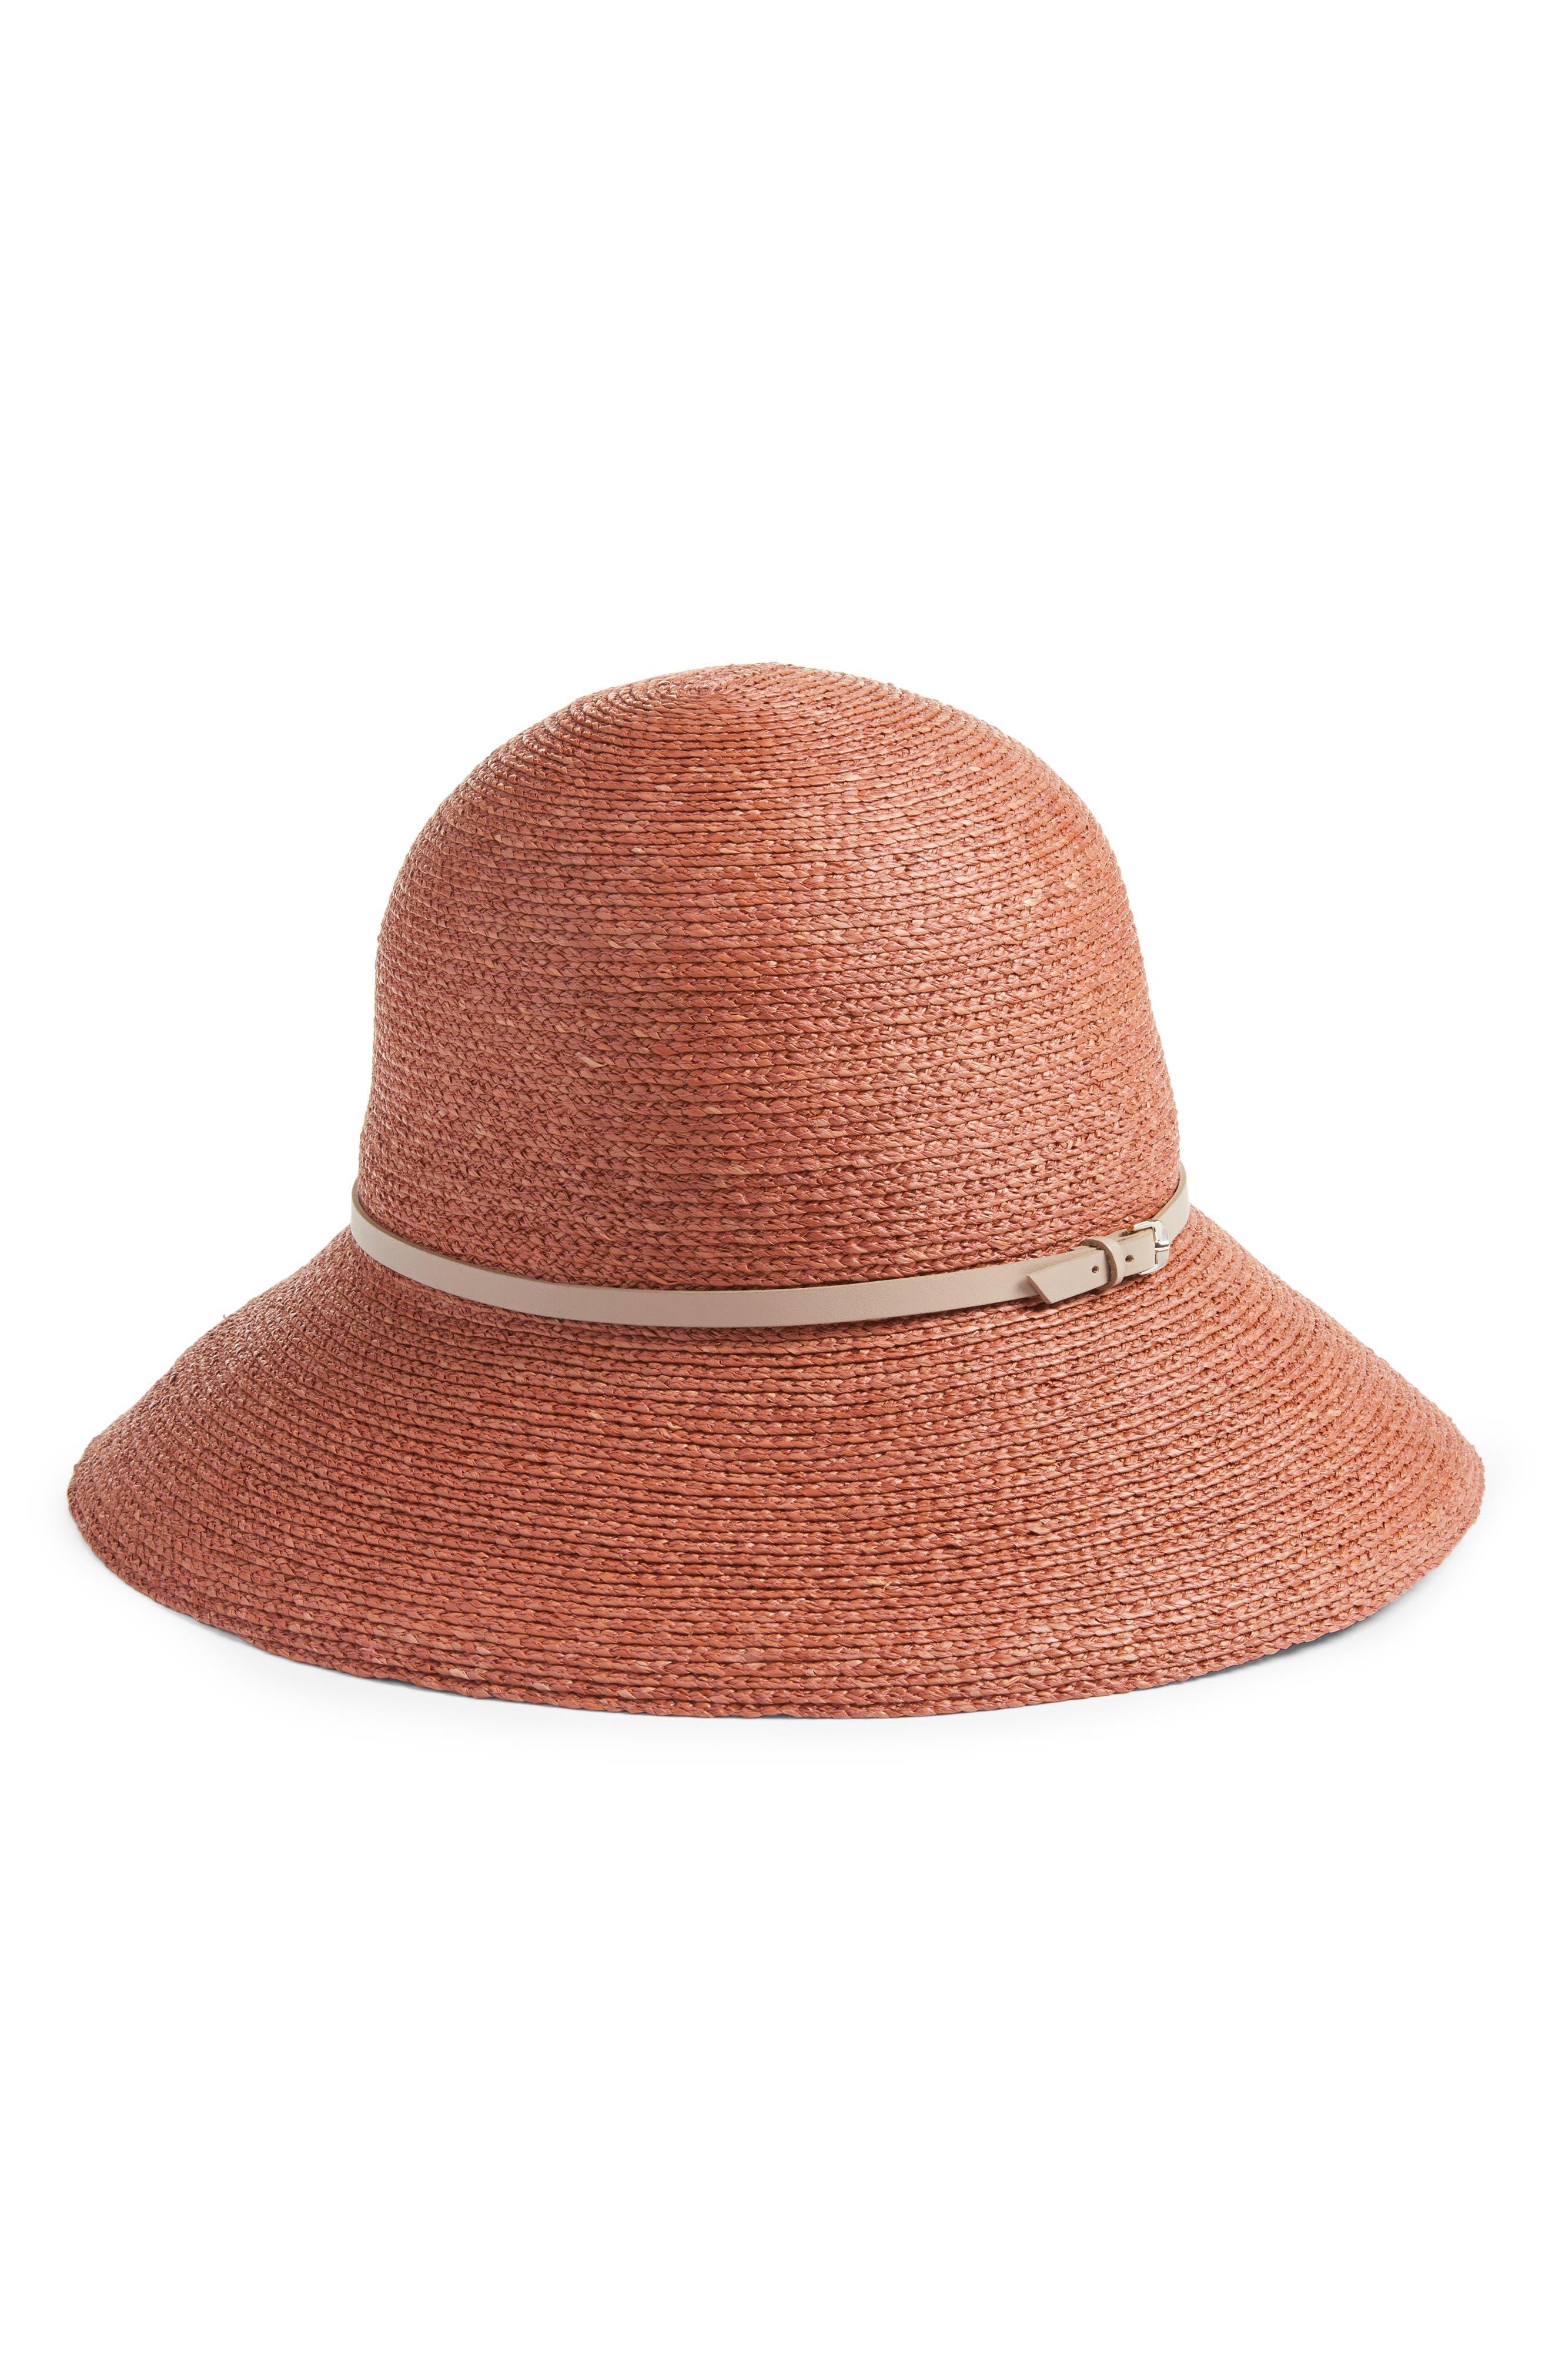 Main Image - Helen Kaminski Packable Raffia Cloche Hat